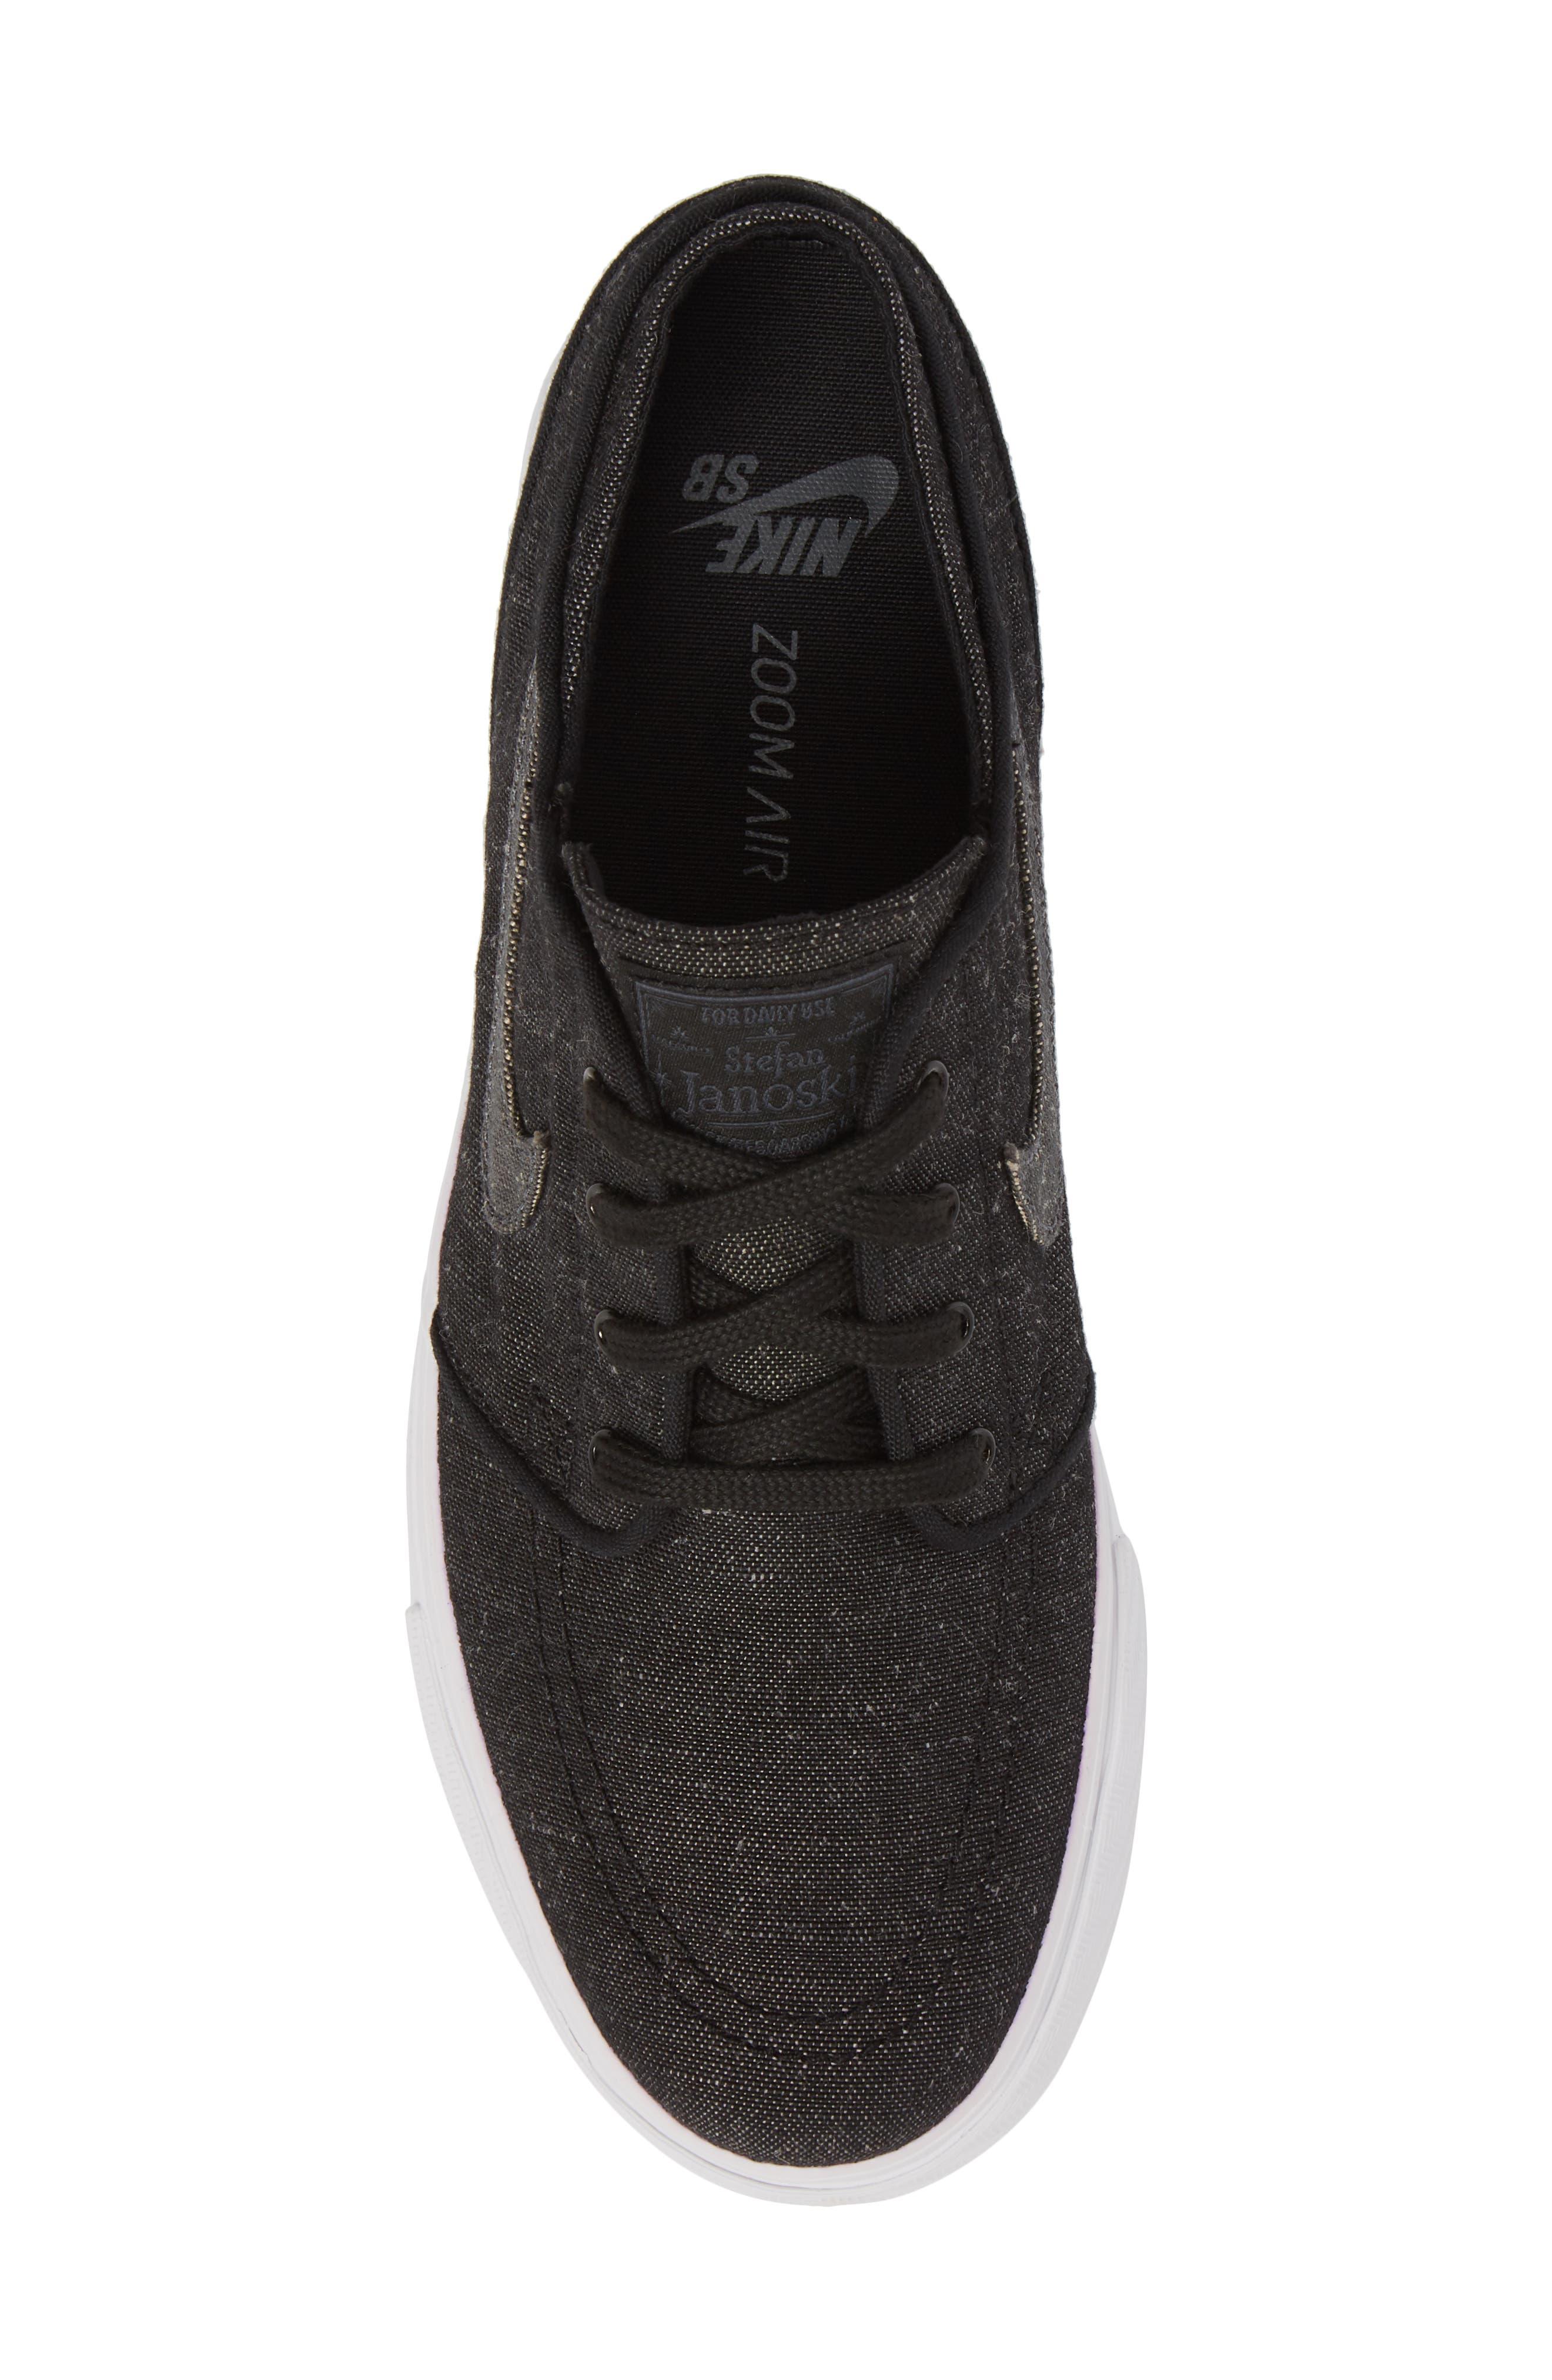 SB Zoom Stefan Janoski Canvas Deconstructed Skateboarding Sneaker,                             Alternate thumbnail 5, color,                             Black/ Anthracite/ Hyper Royal